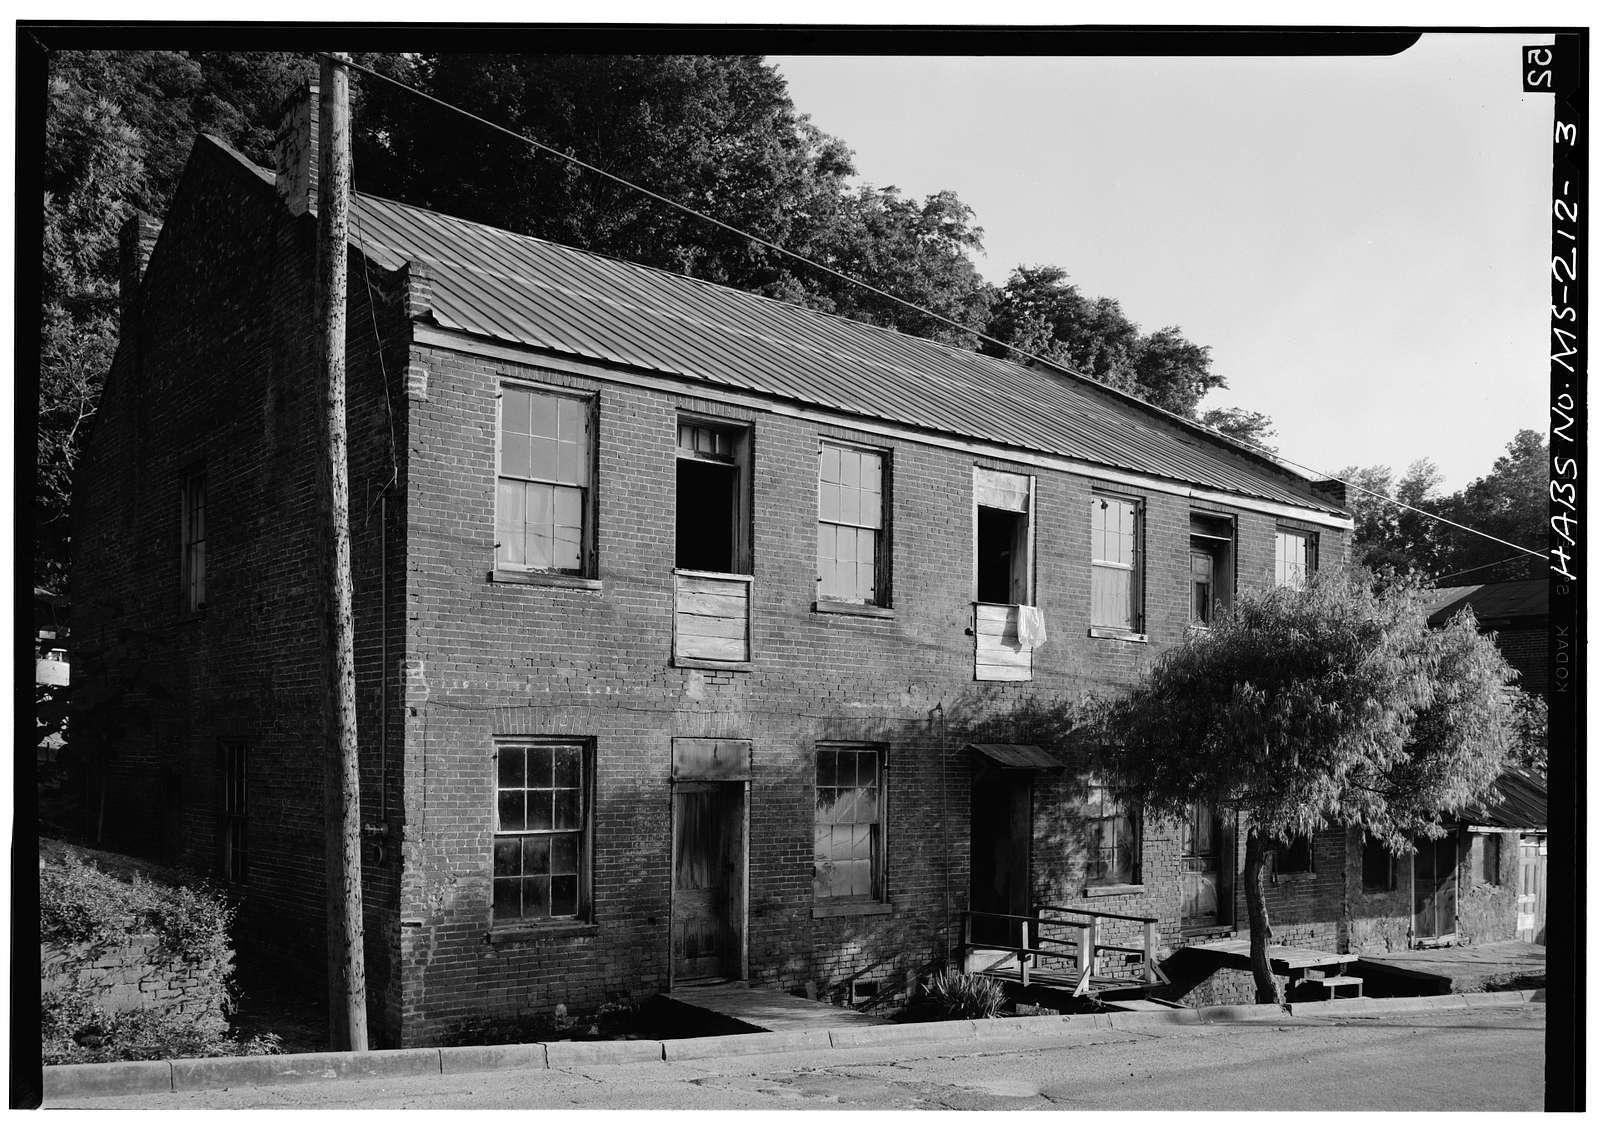 Natchez Bluffs & Under-the-Hill Historic District, Silver Street & adjacent area, Natchez, Adams County, MS